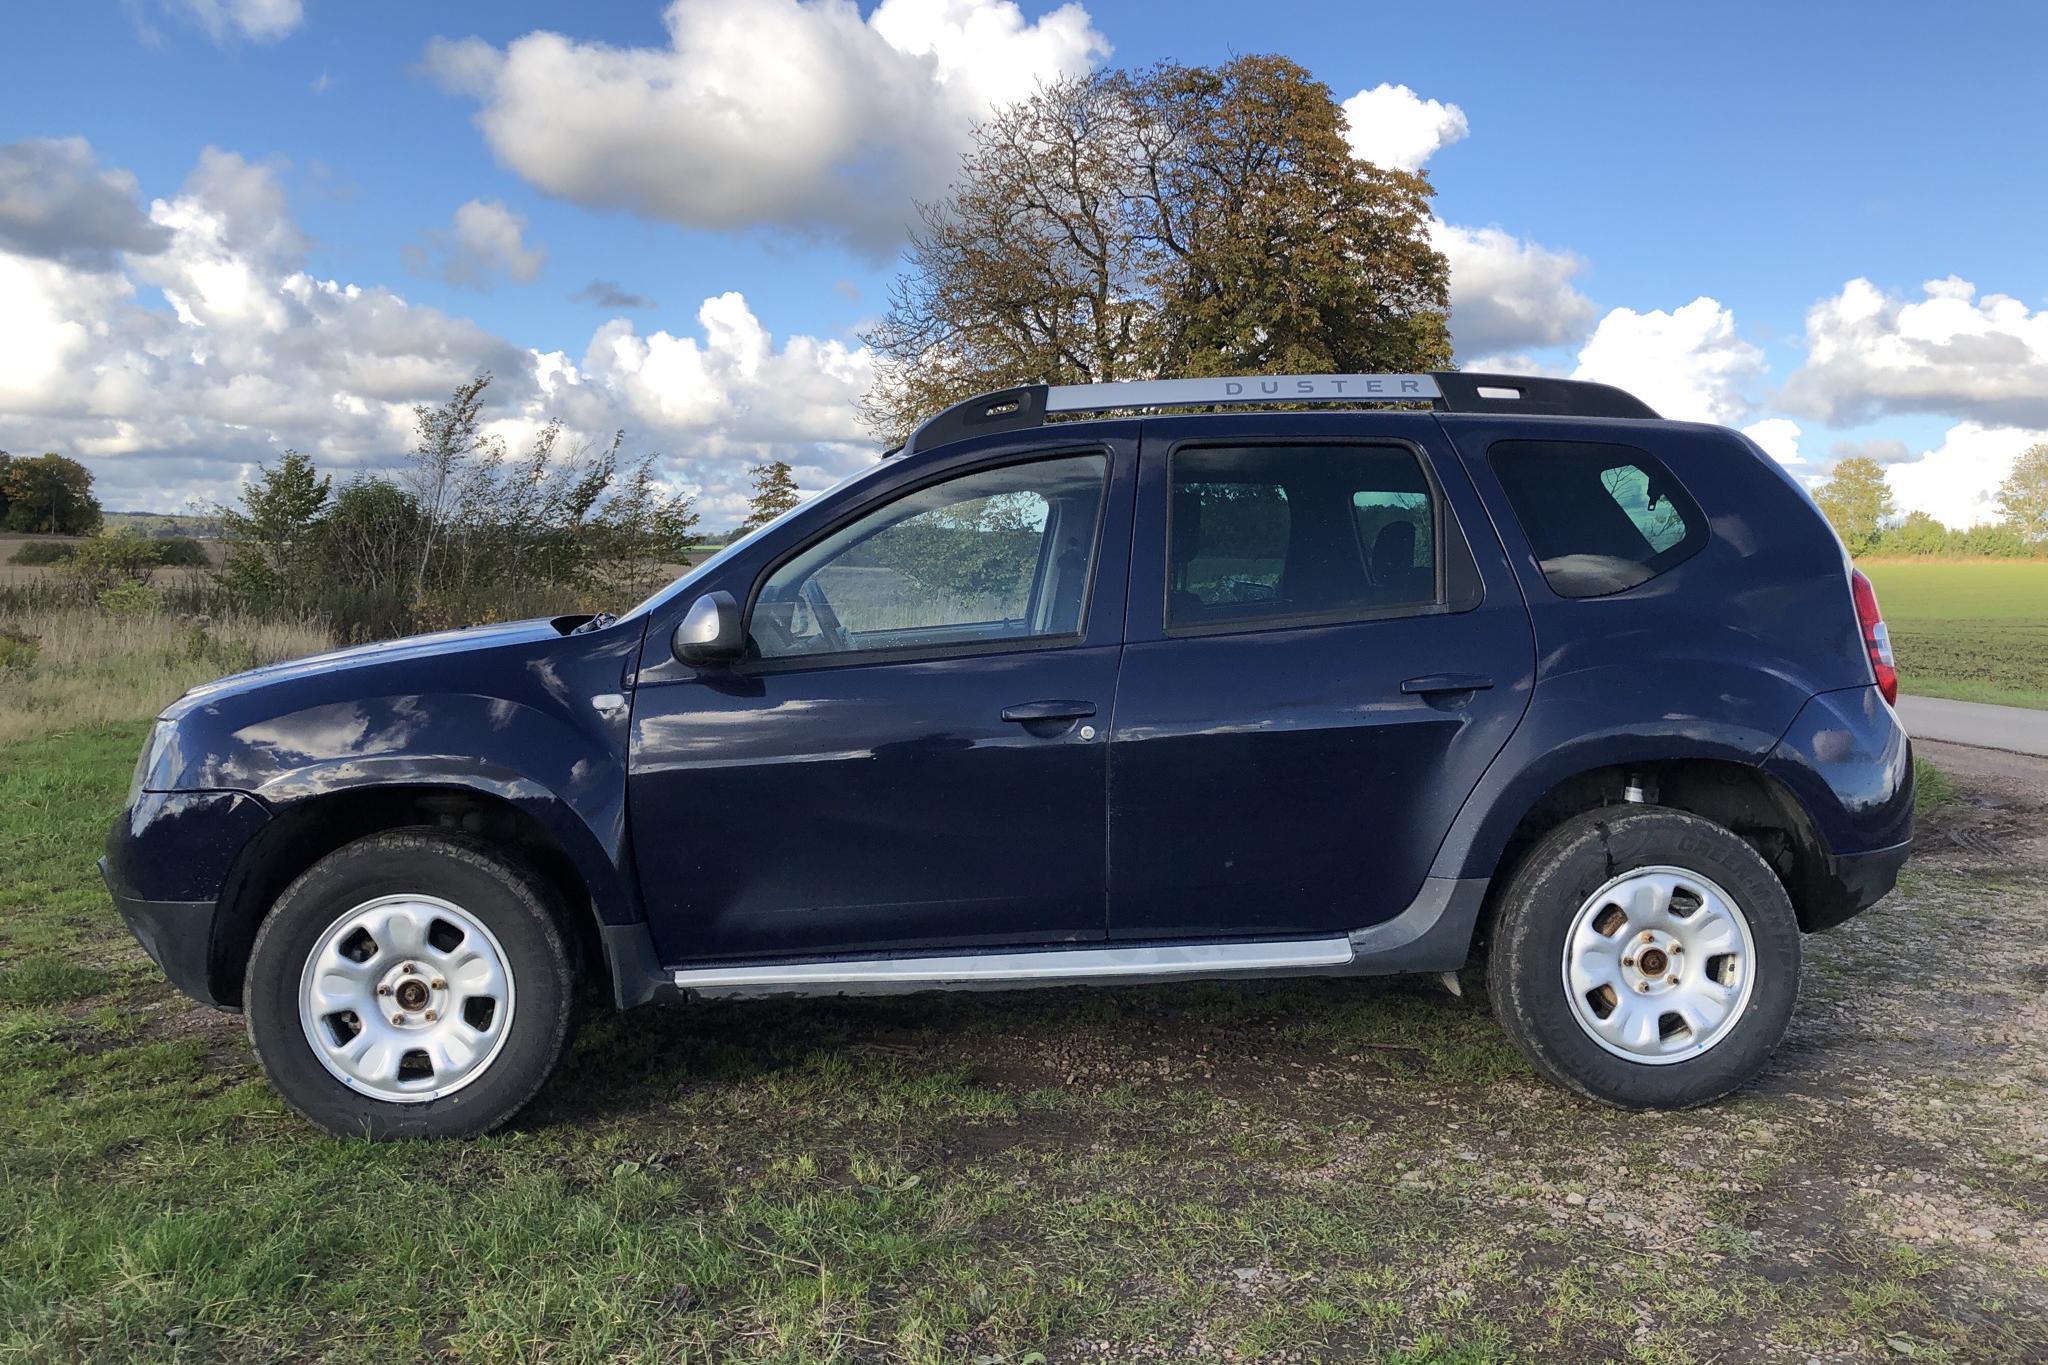 Dacia Duster 1.5 dCi 4x4 (109hk) - 0 km - blue - 2014